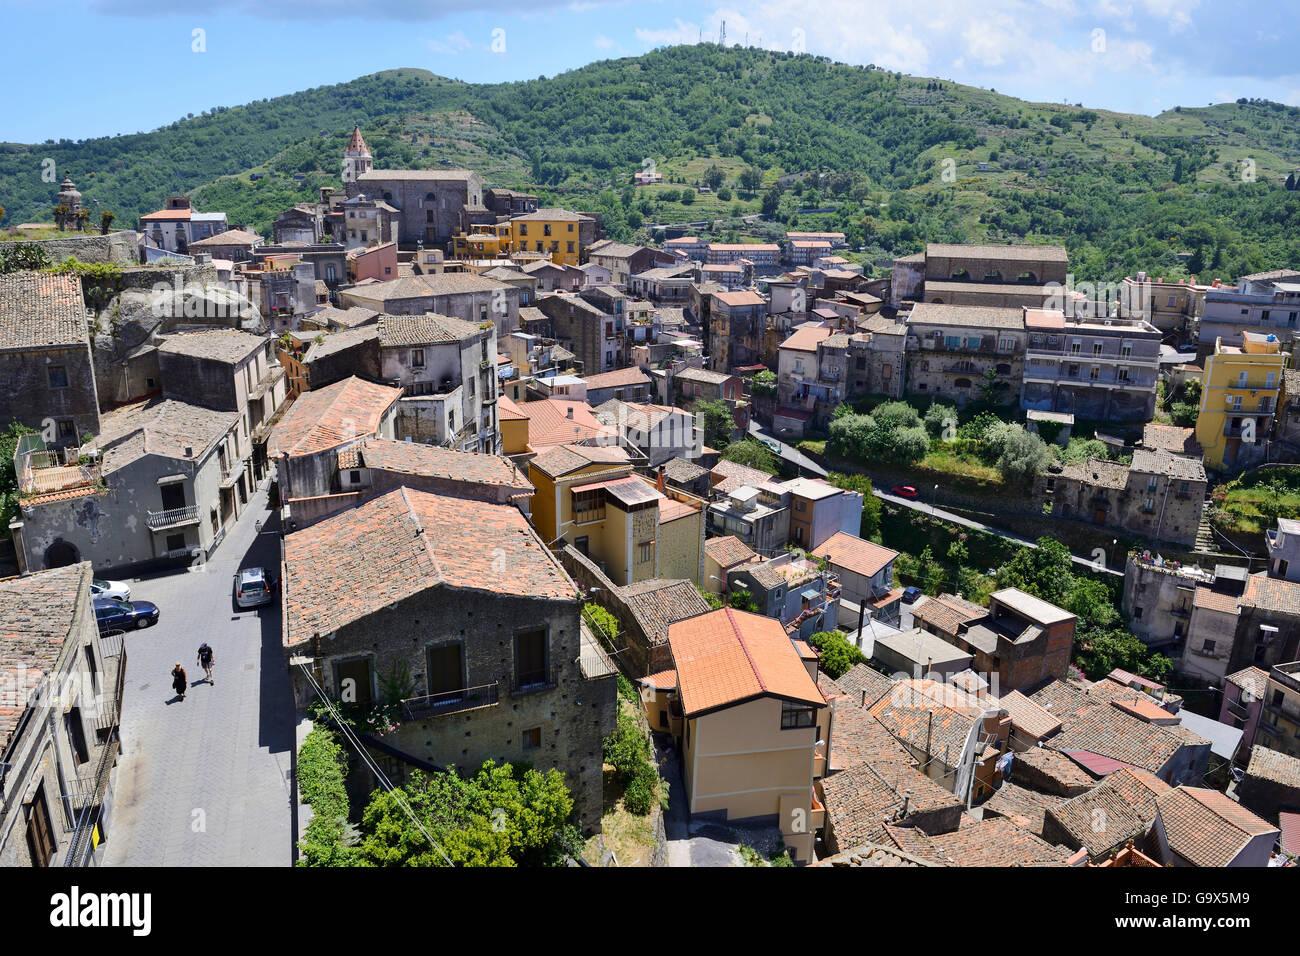 View over red tiled rooftops of Castiglione di Sicilia, Sicily, Italy - Stock Image